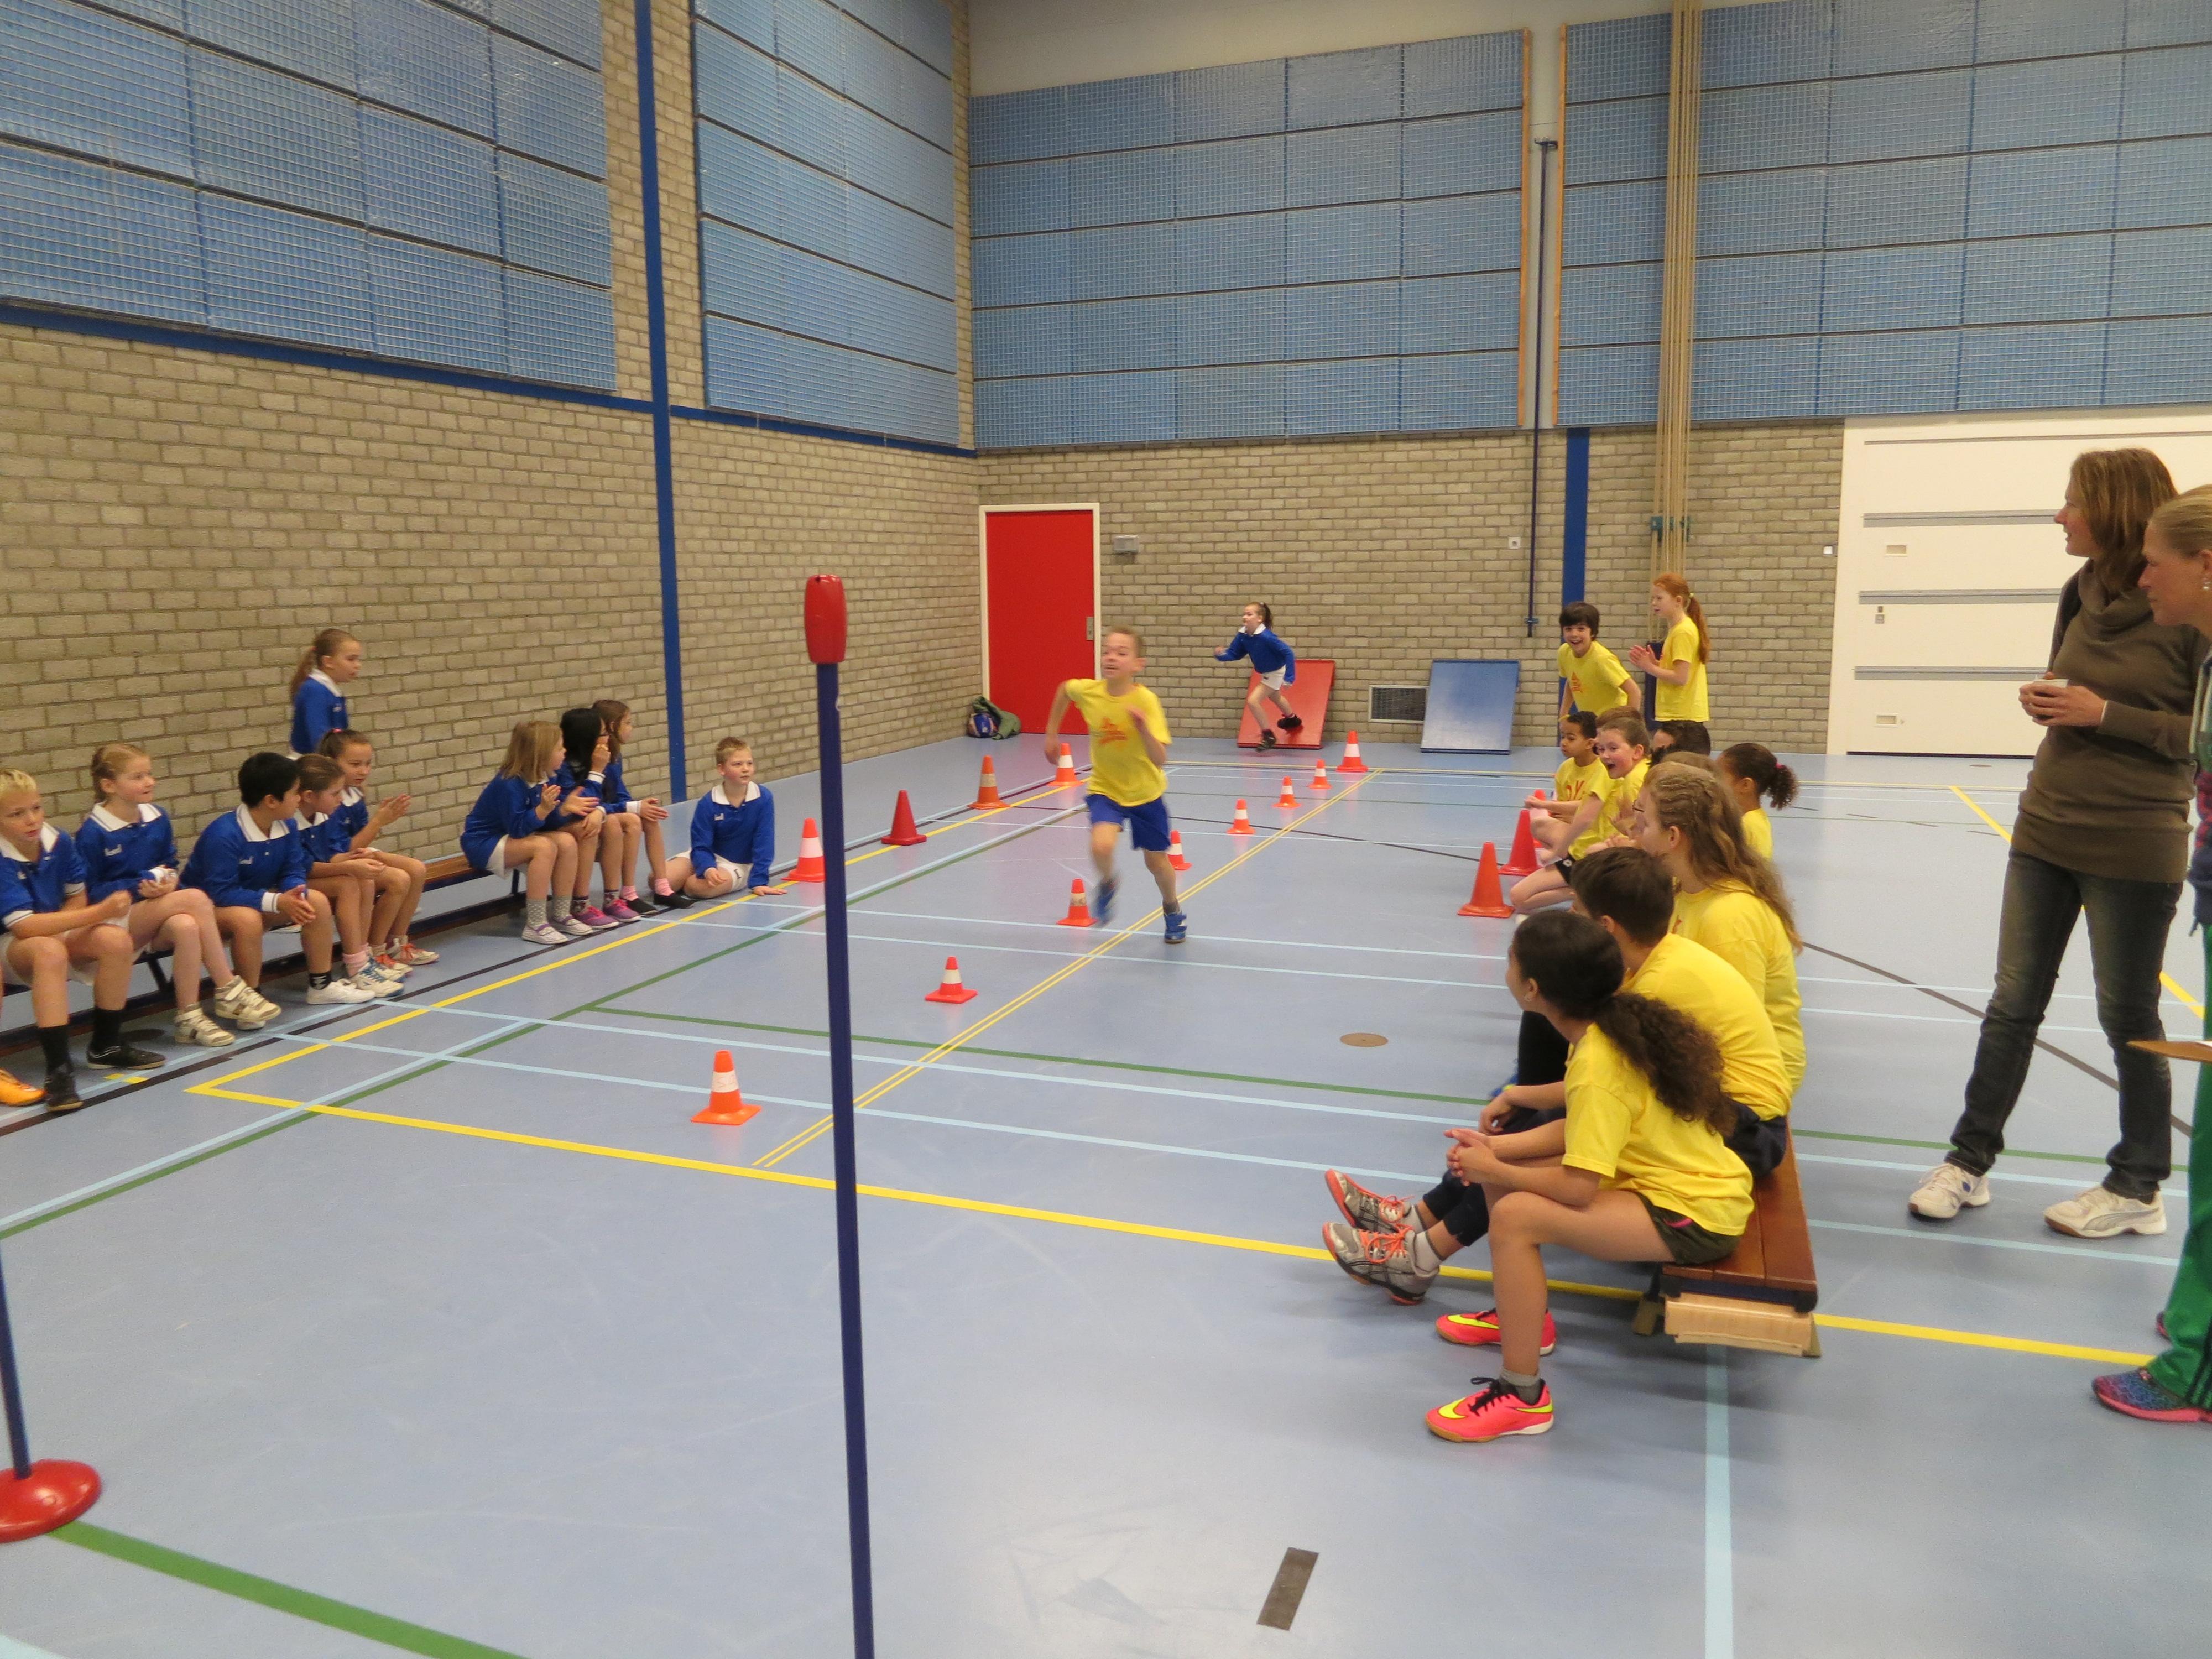 Fun in athletics - vrijwilligers gevraagd